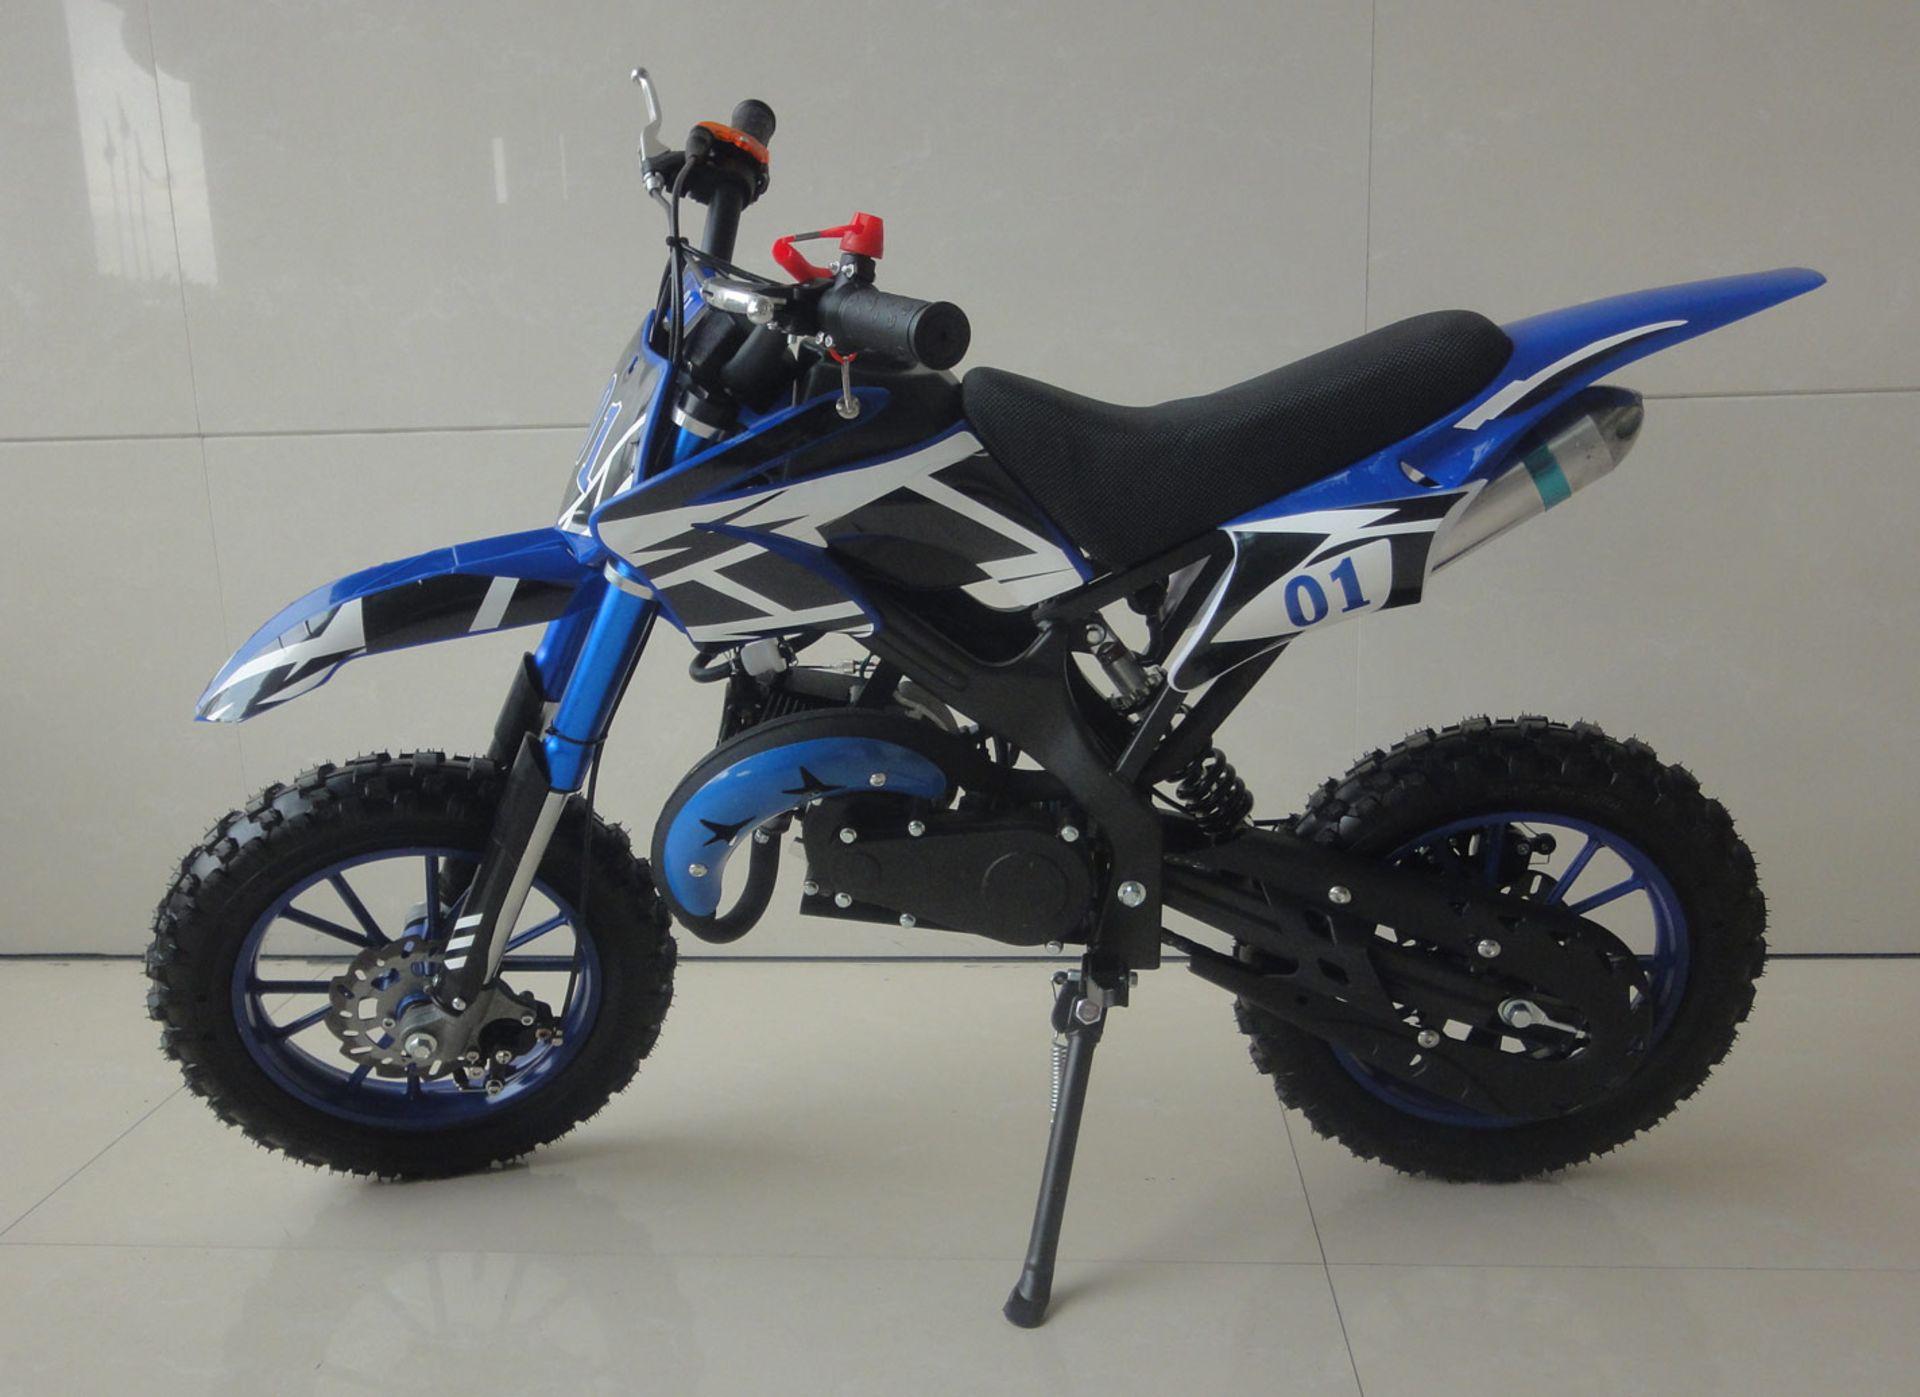 + VAT Brand New 49cc Falcon Mini Dirt Bike - Full Front & Rear Suspension - Disc Brakes - Easy Pull - Image 3 of 6